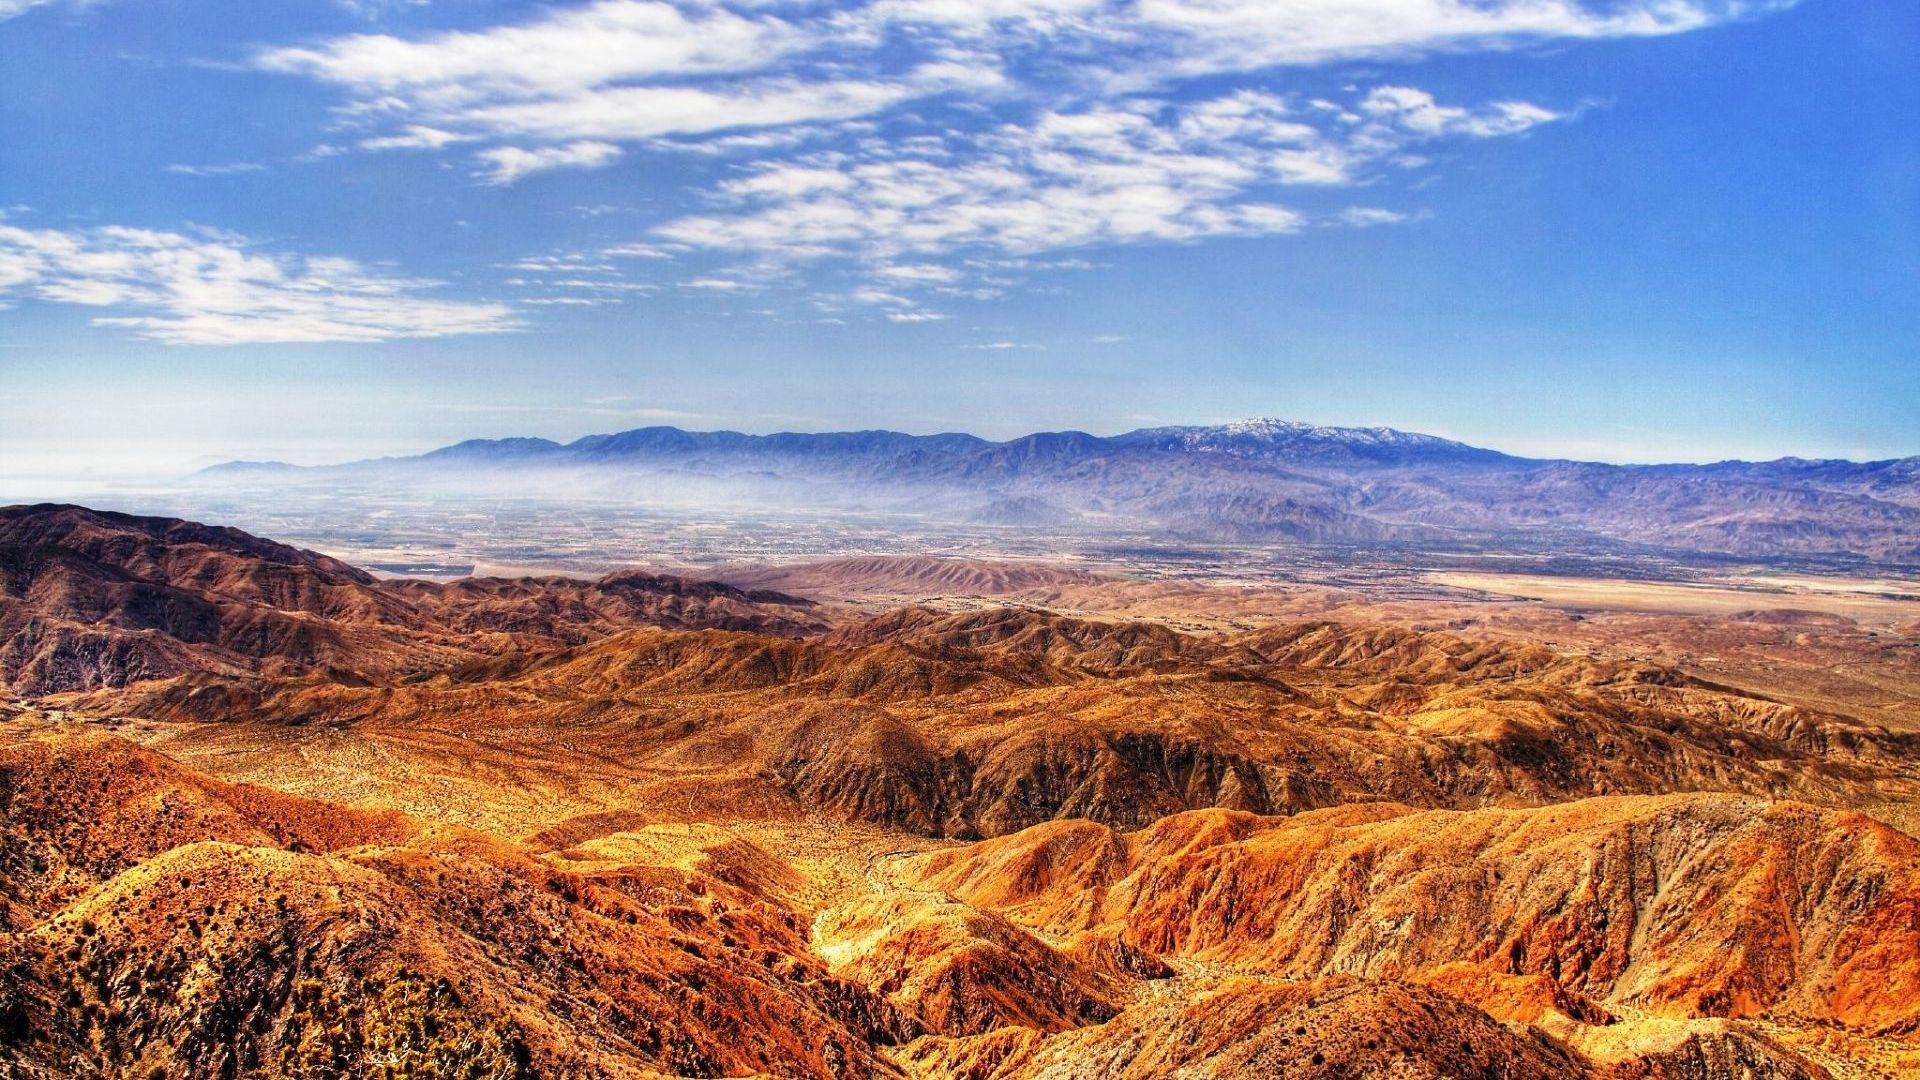 Desert Foothills Landscape wallpaper 1080p